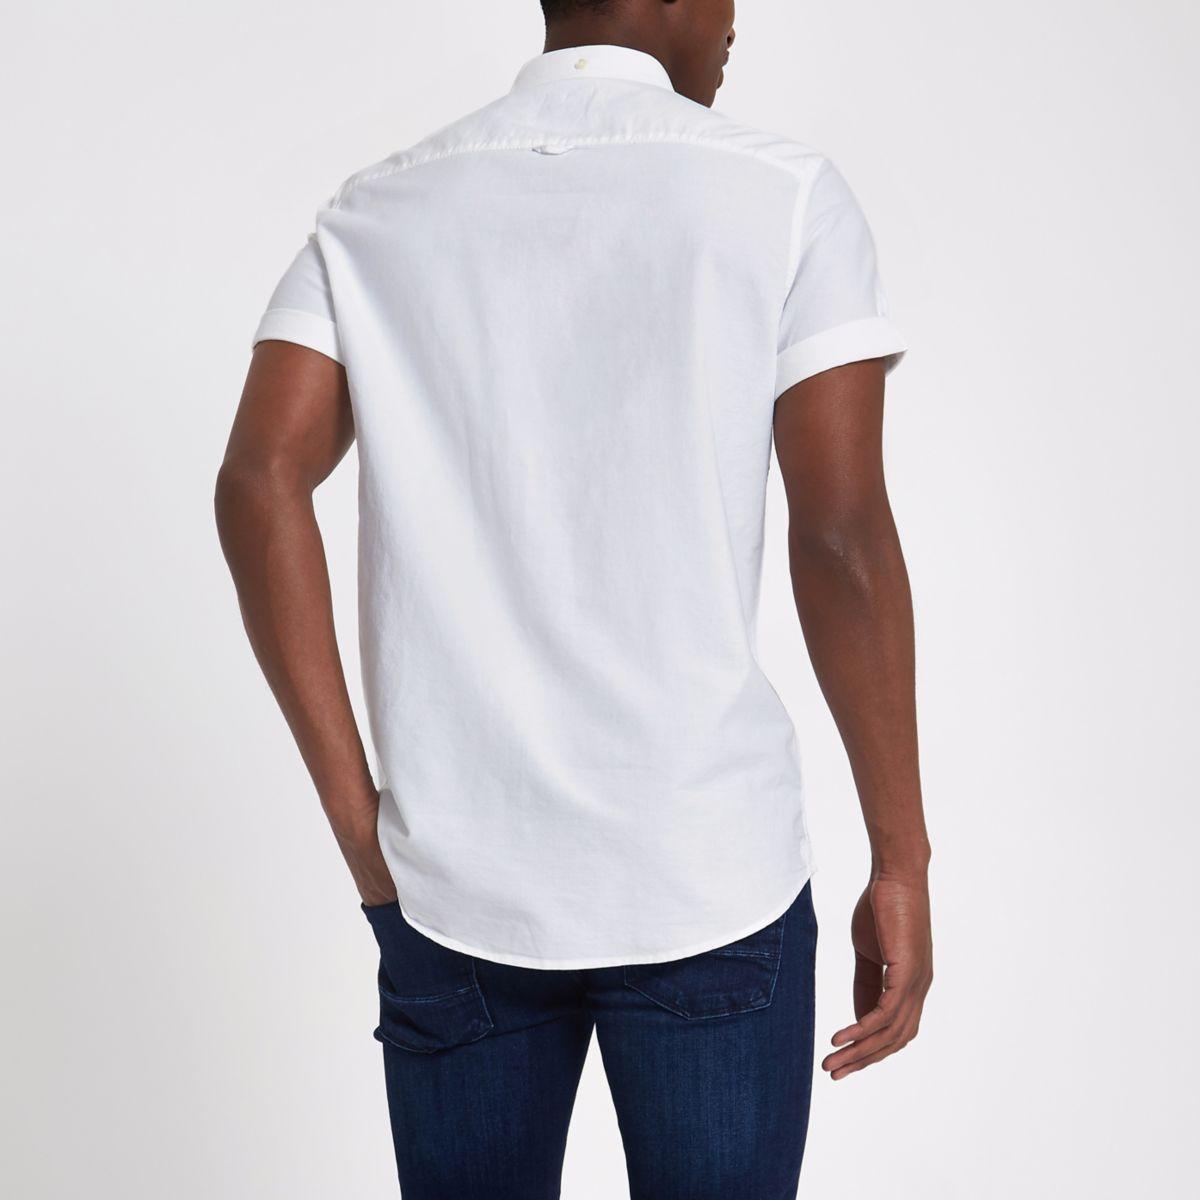 embroidered shirt wasp shirt Oxford embroidered White White wasp wasp Oxford White SqvtAtWP4